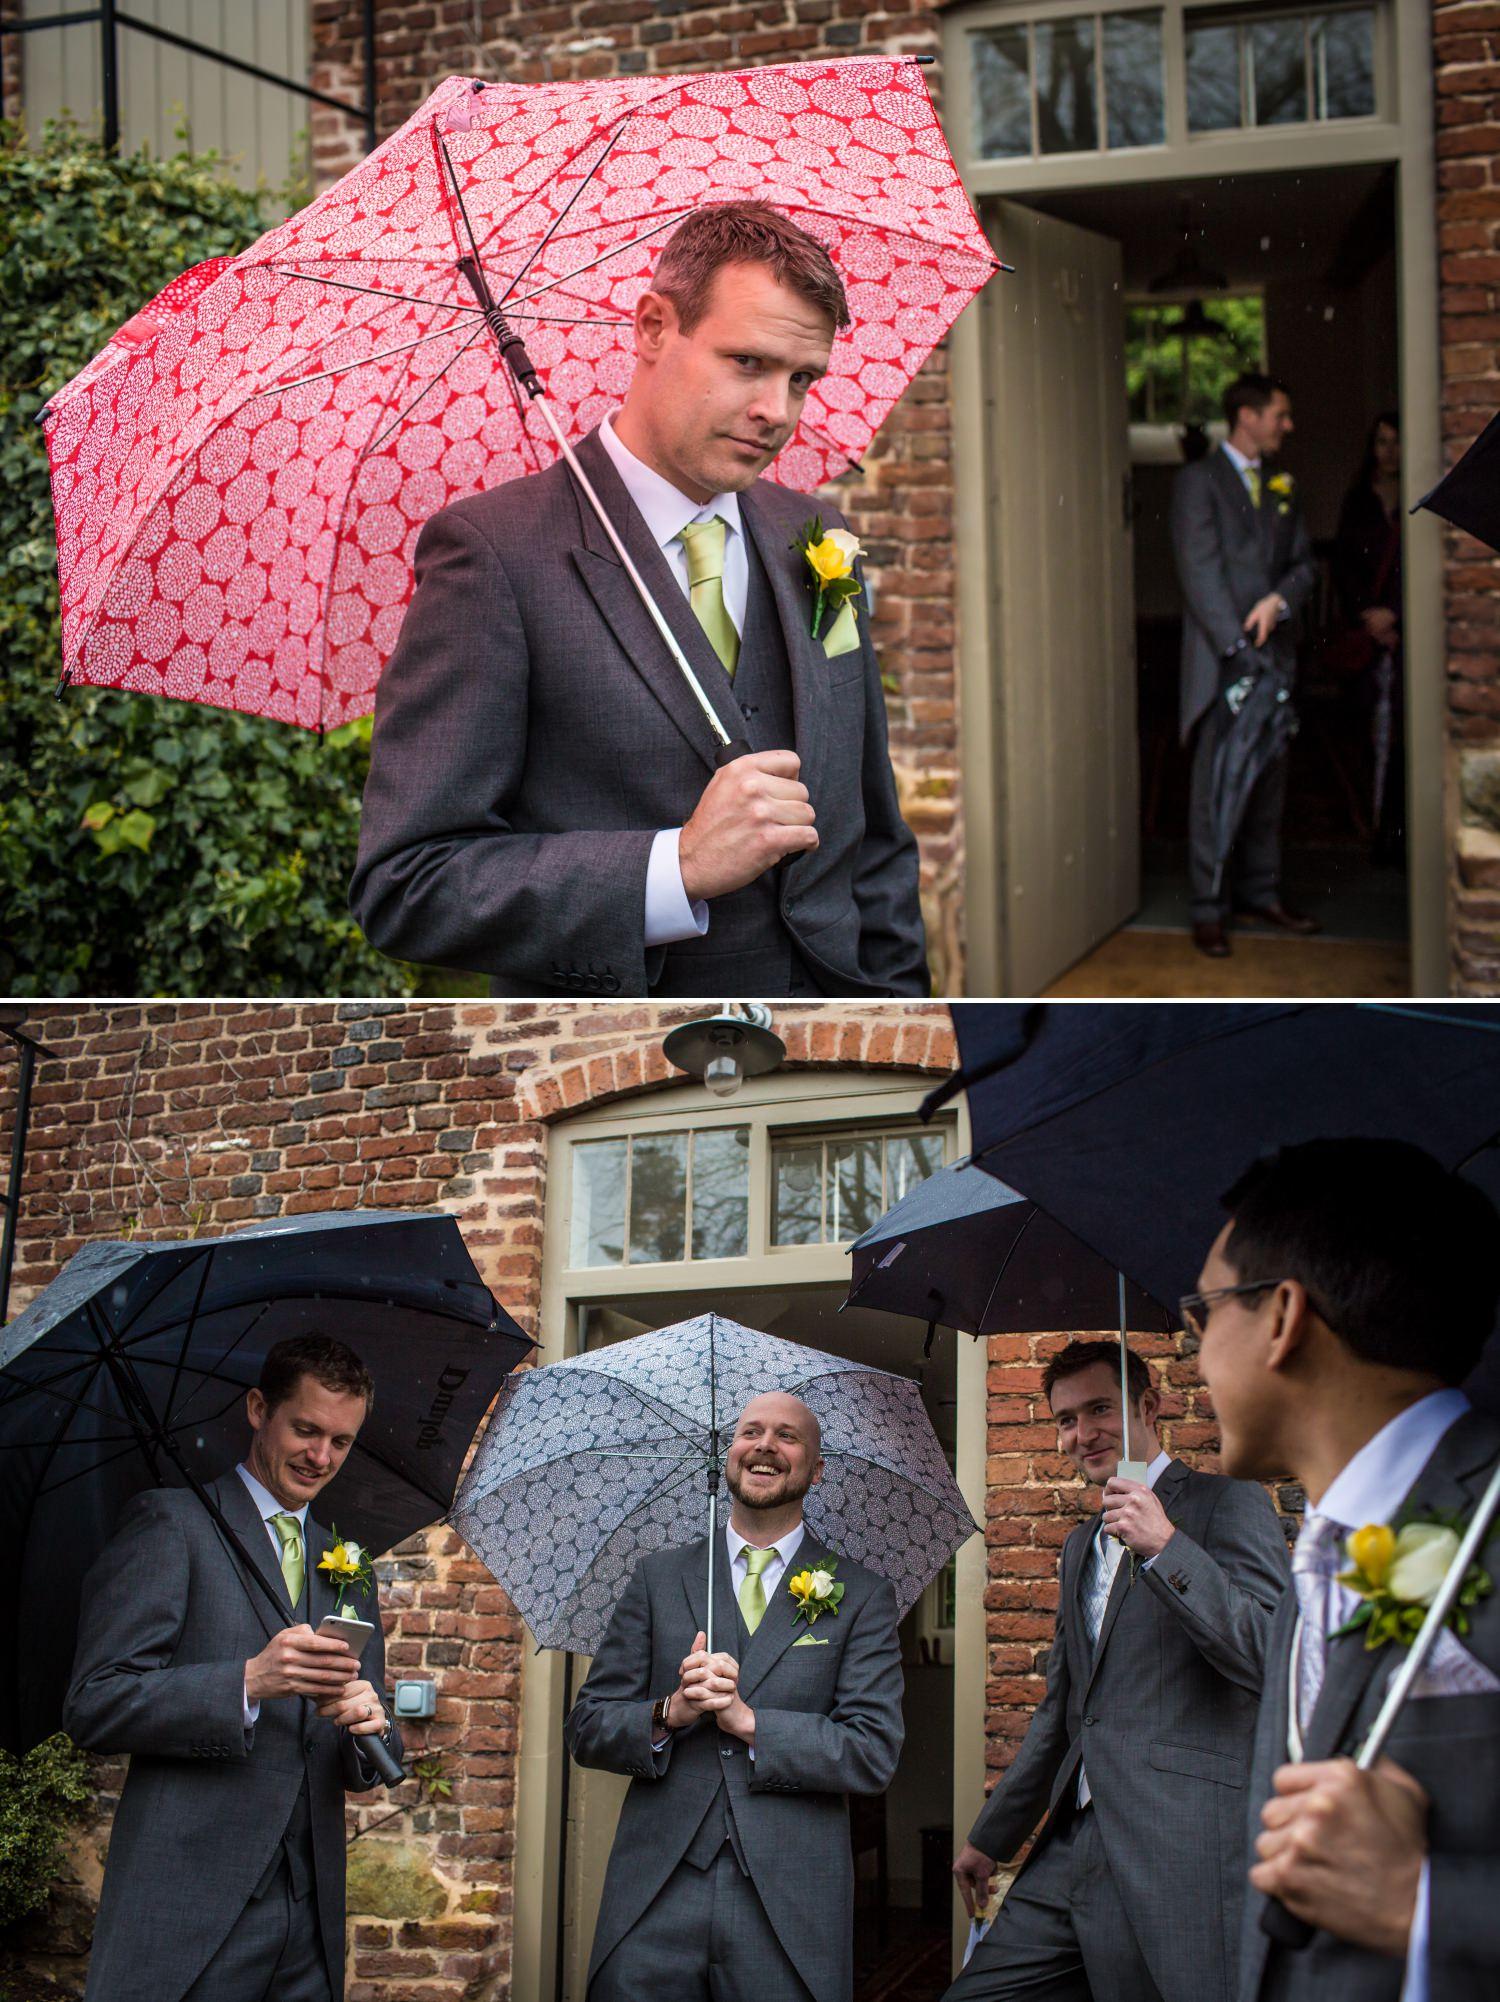 Wedding Photograph of guys under umbrellas at Pimhill Barn, Shropshire